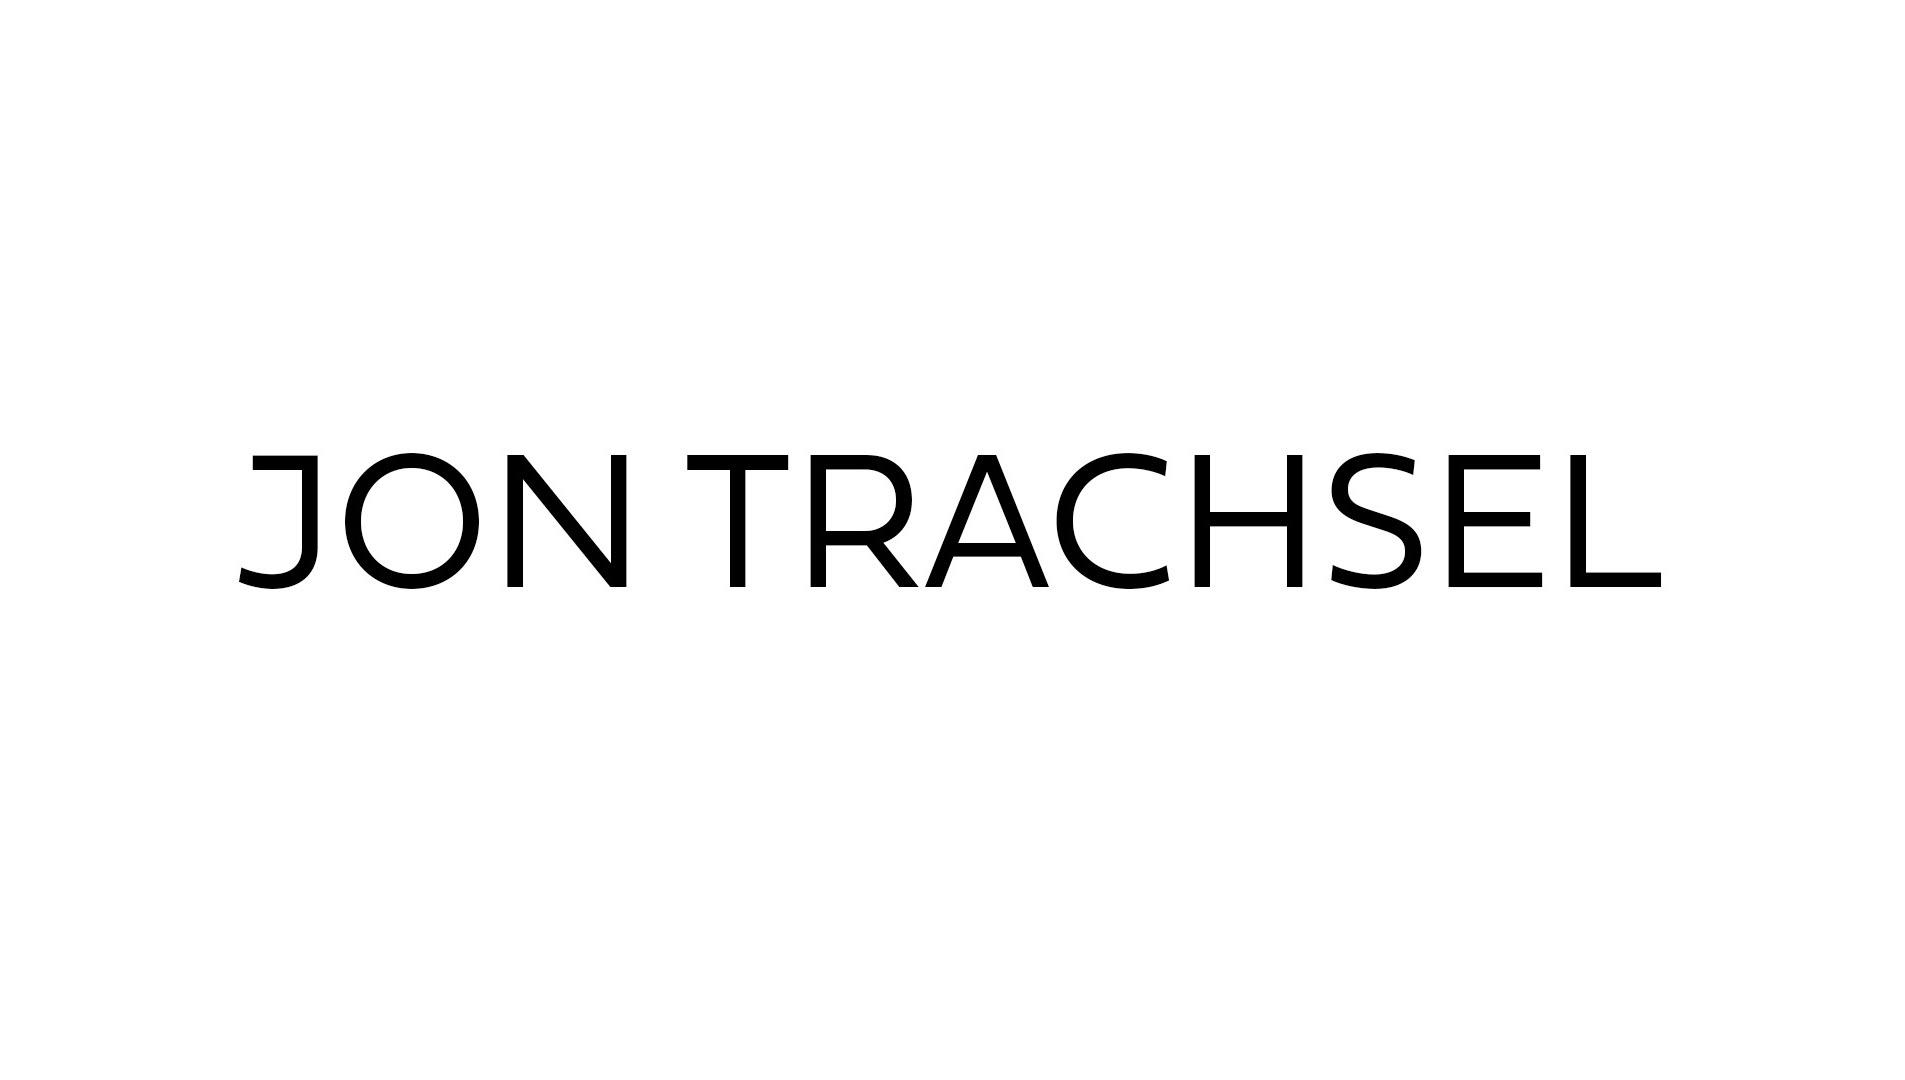 Jon Trachsel